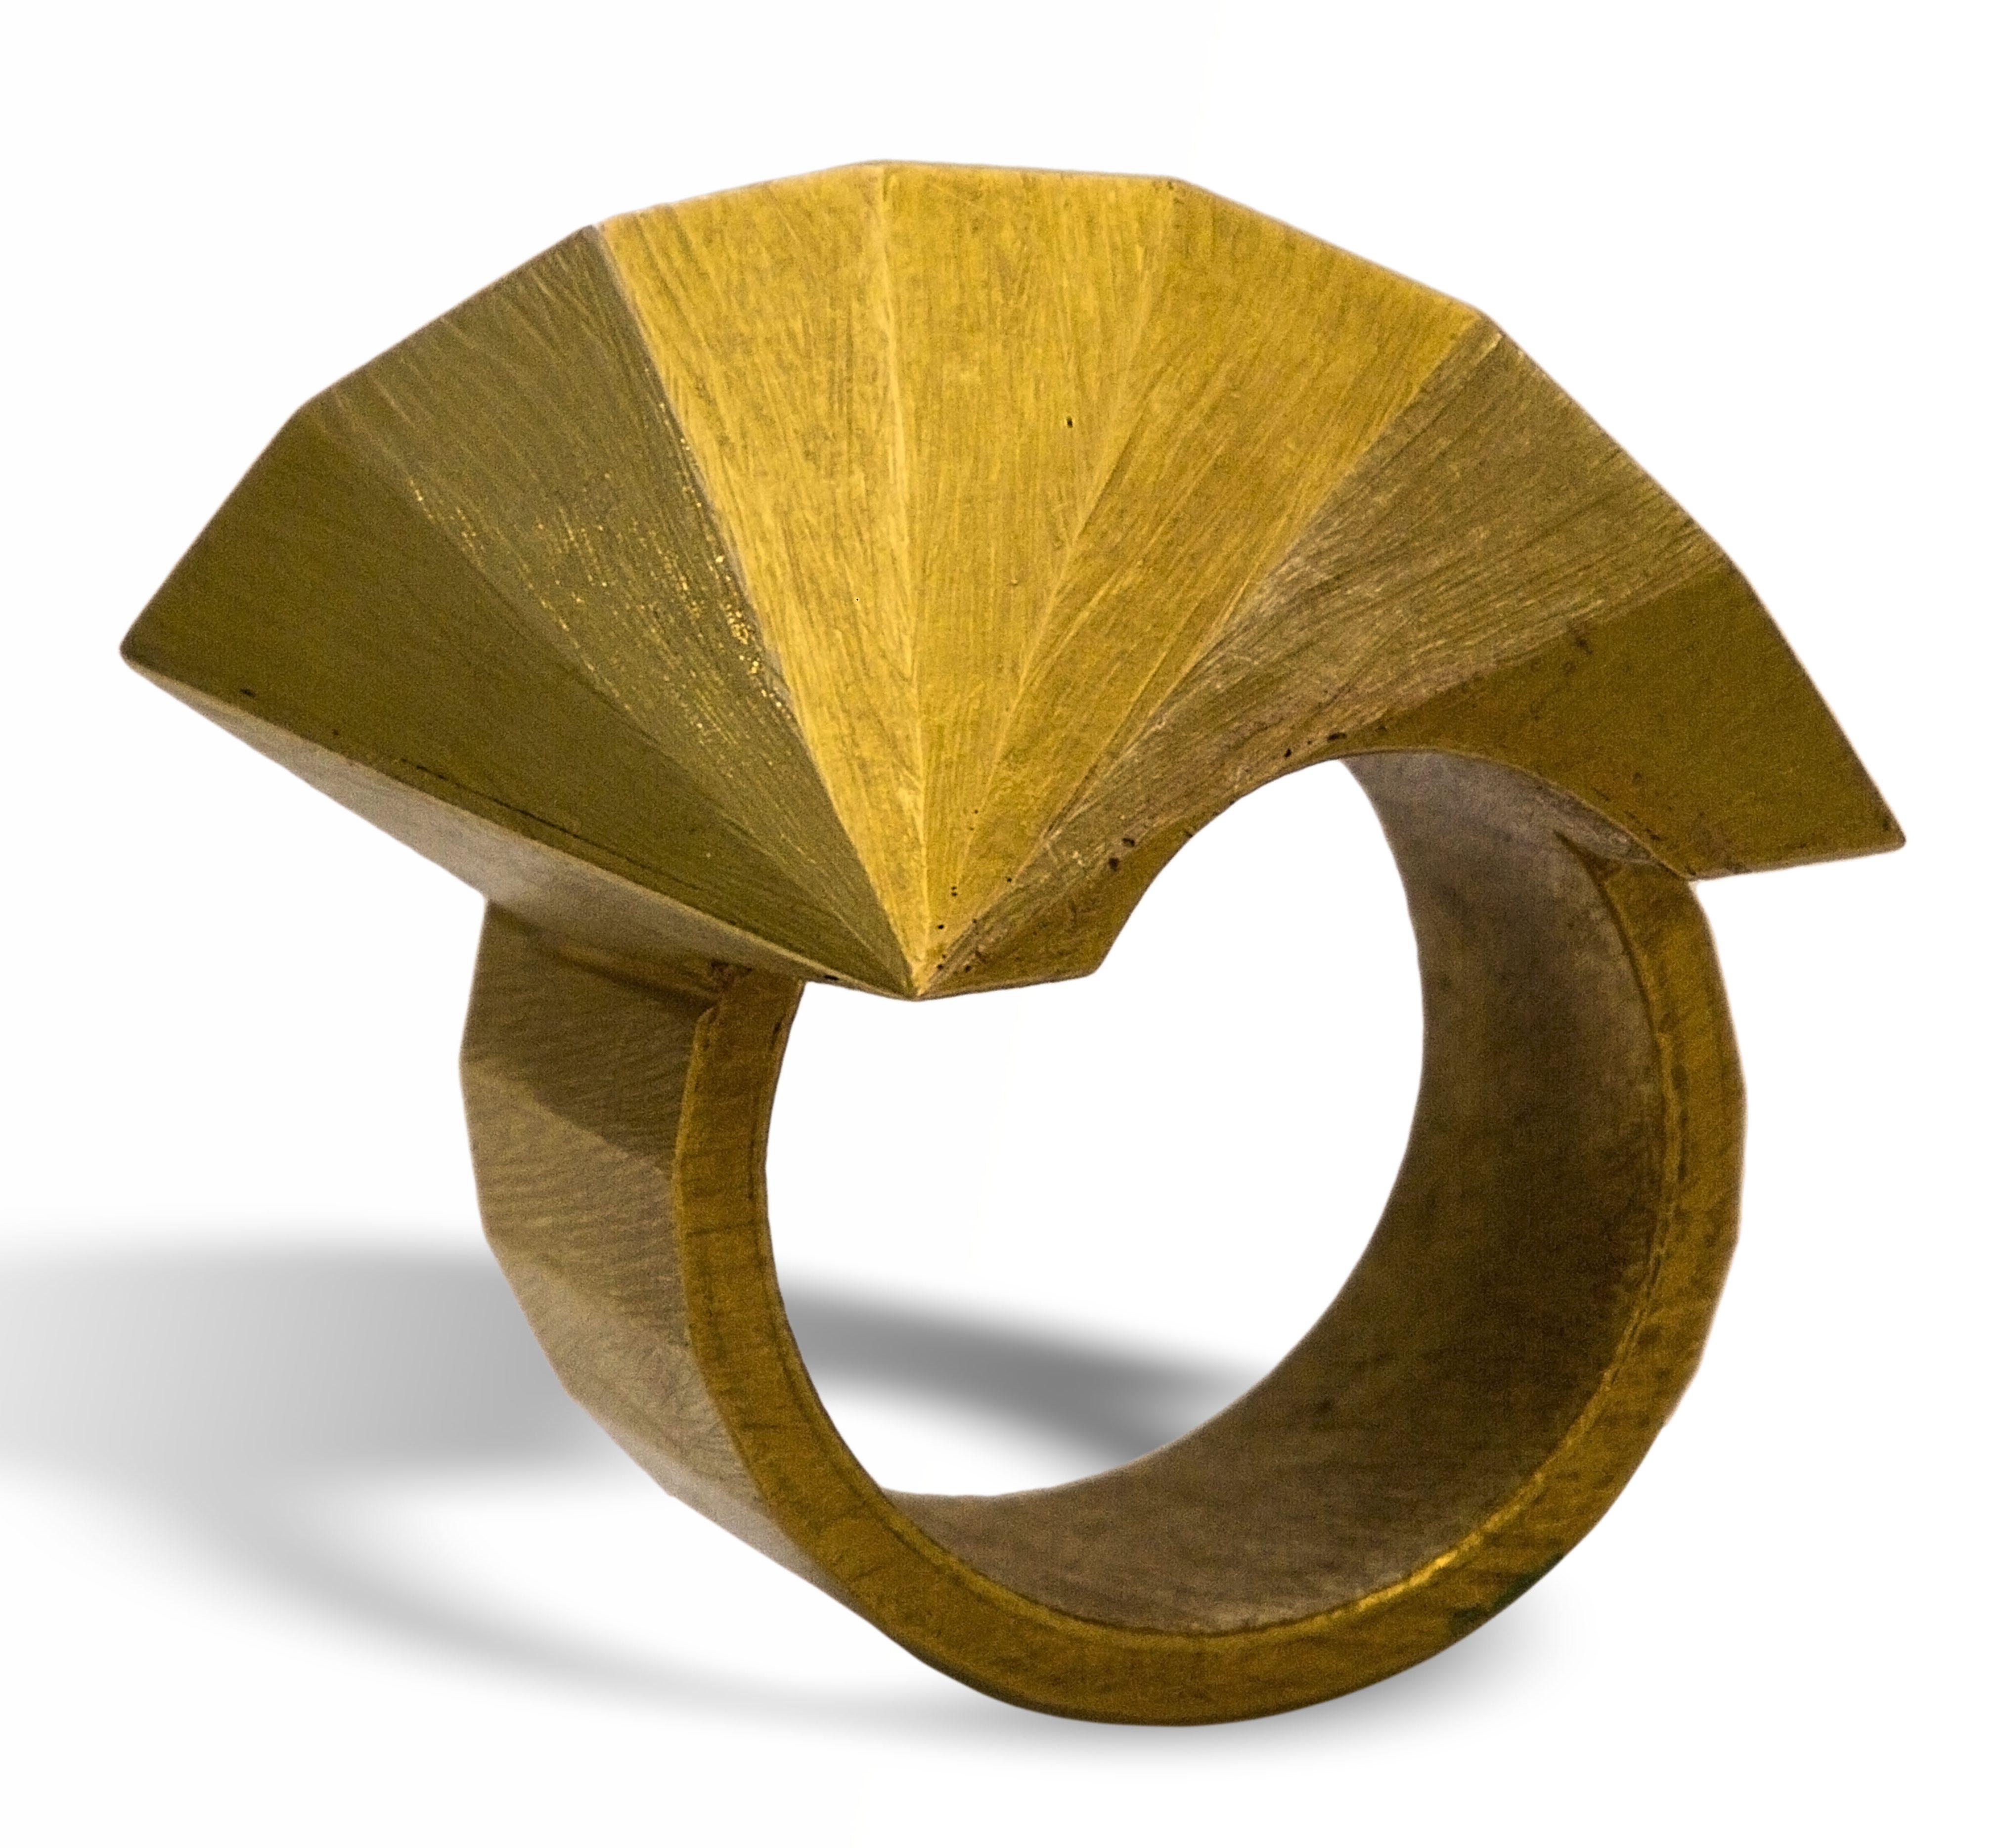 Giampaolo Babetto, ring. Collectie Ida Boelen-van Gelder. Fotografie Aldo Smit©